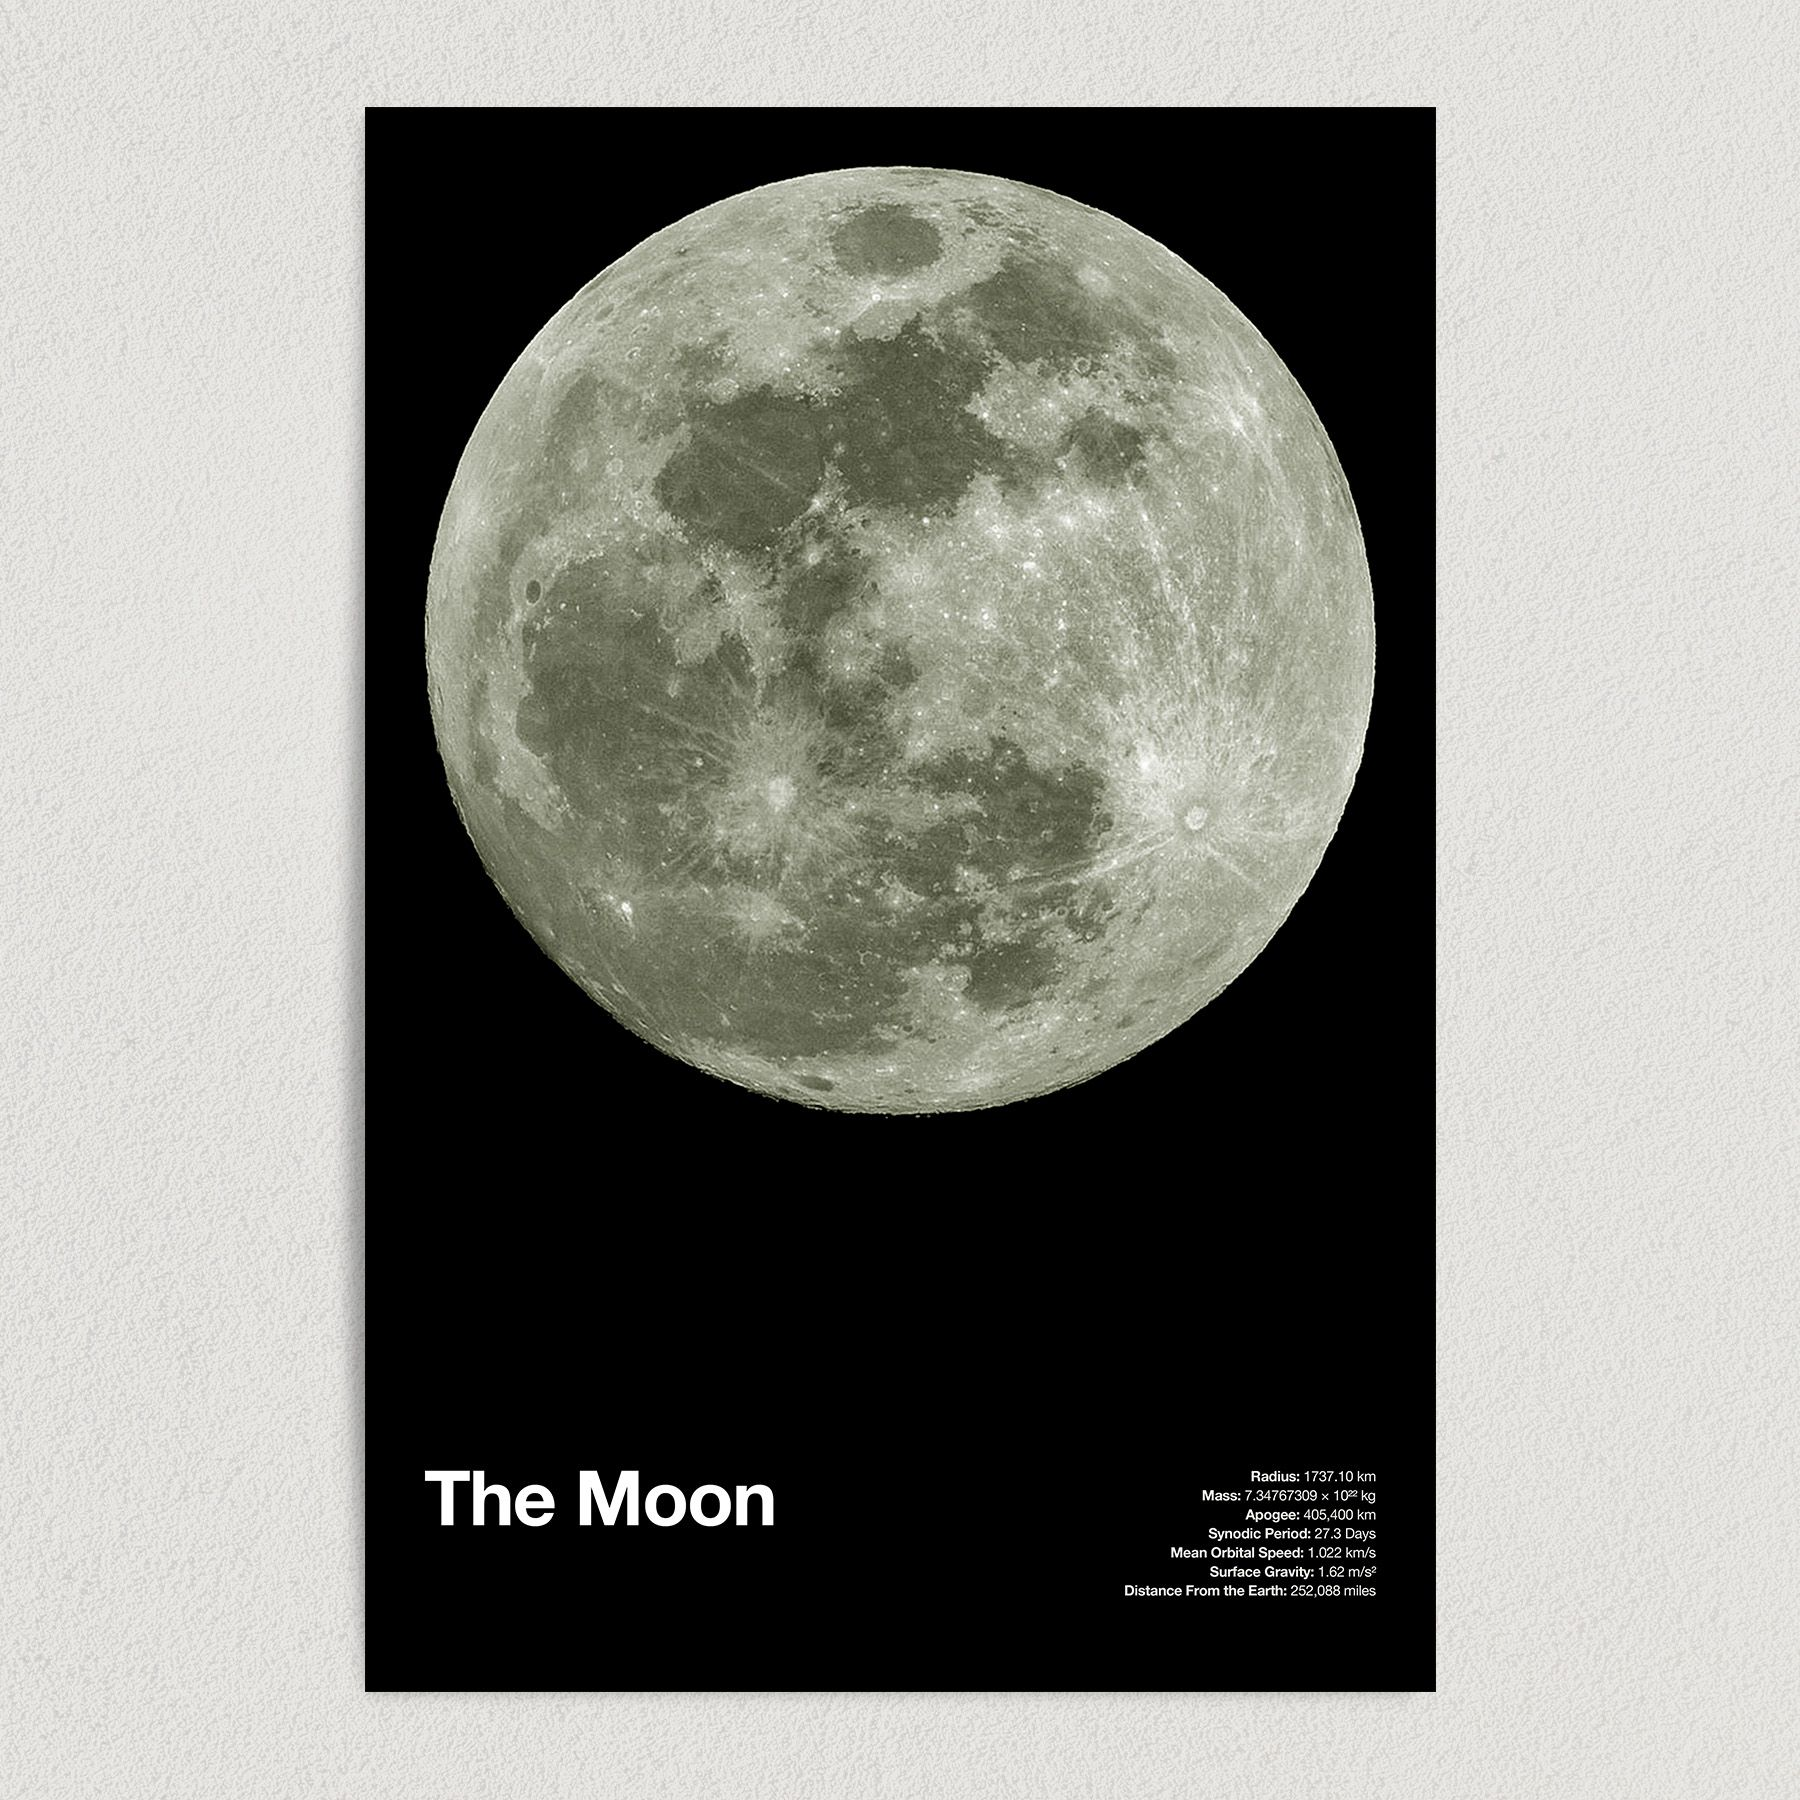 The Moon Astronomy Education Art Print Poster 12″ x 18″ Wall Art SS2155